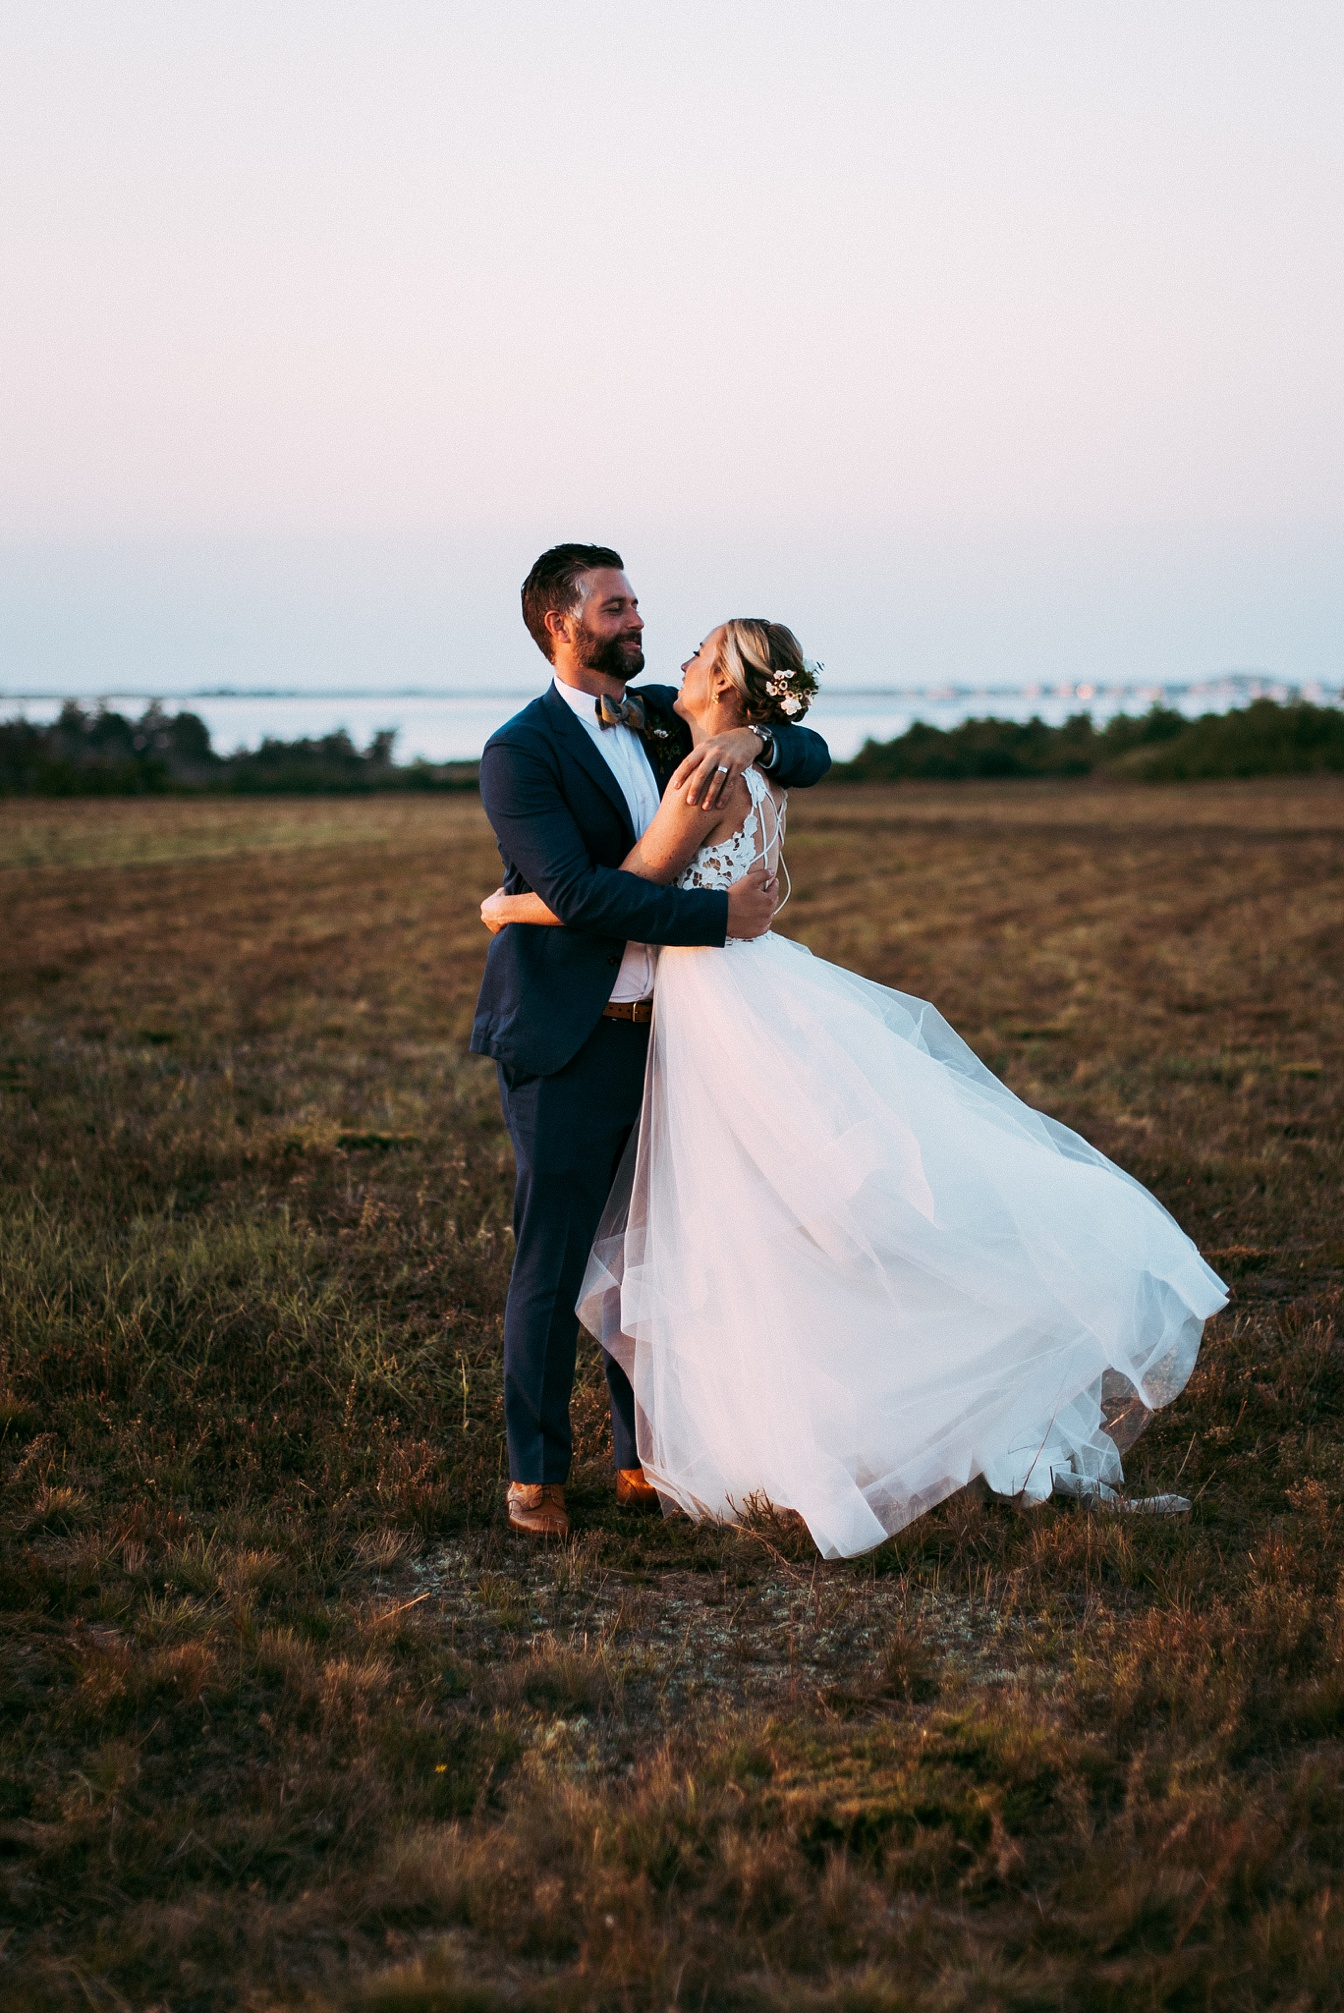 Eliza_Ben_Wedding_The_Foxes_Photography_530.jpg